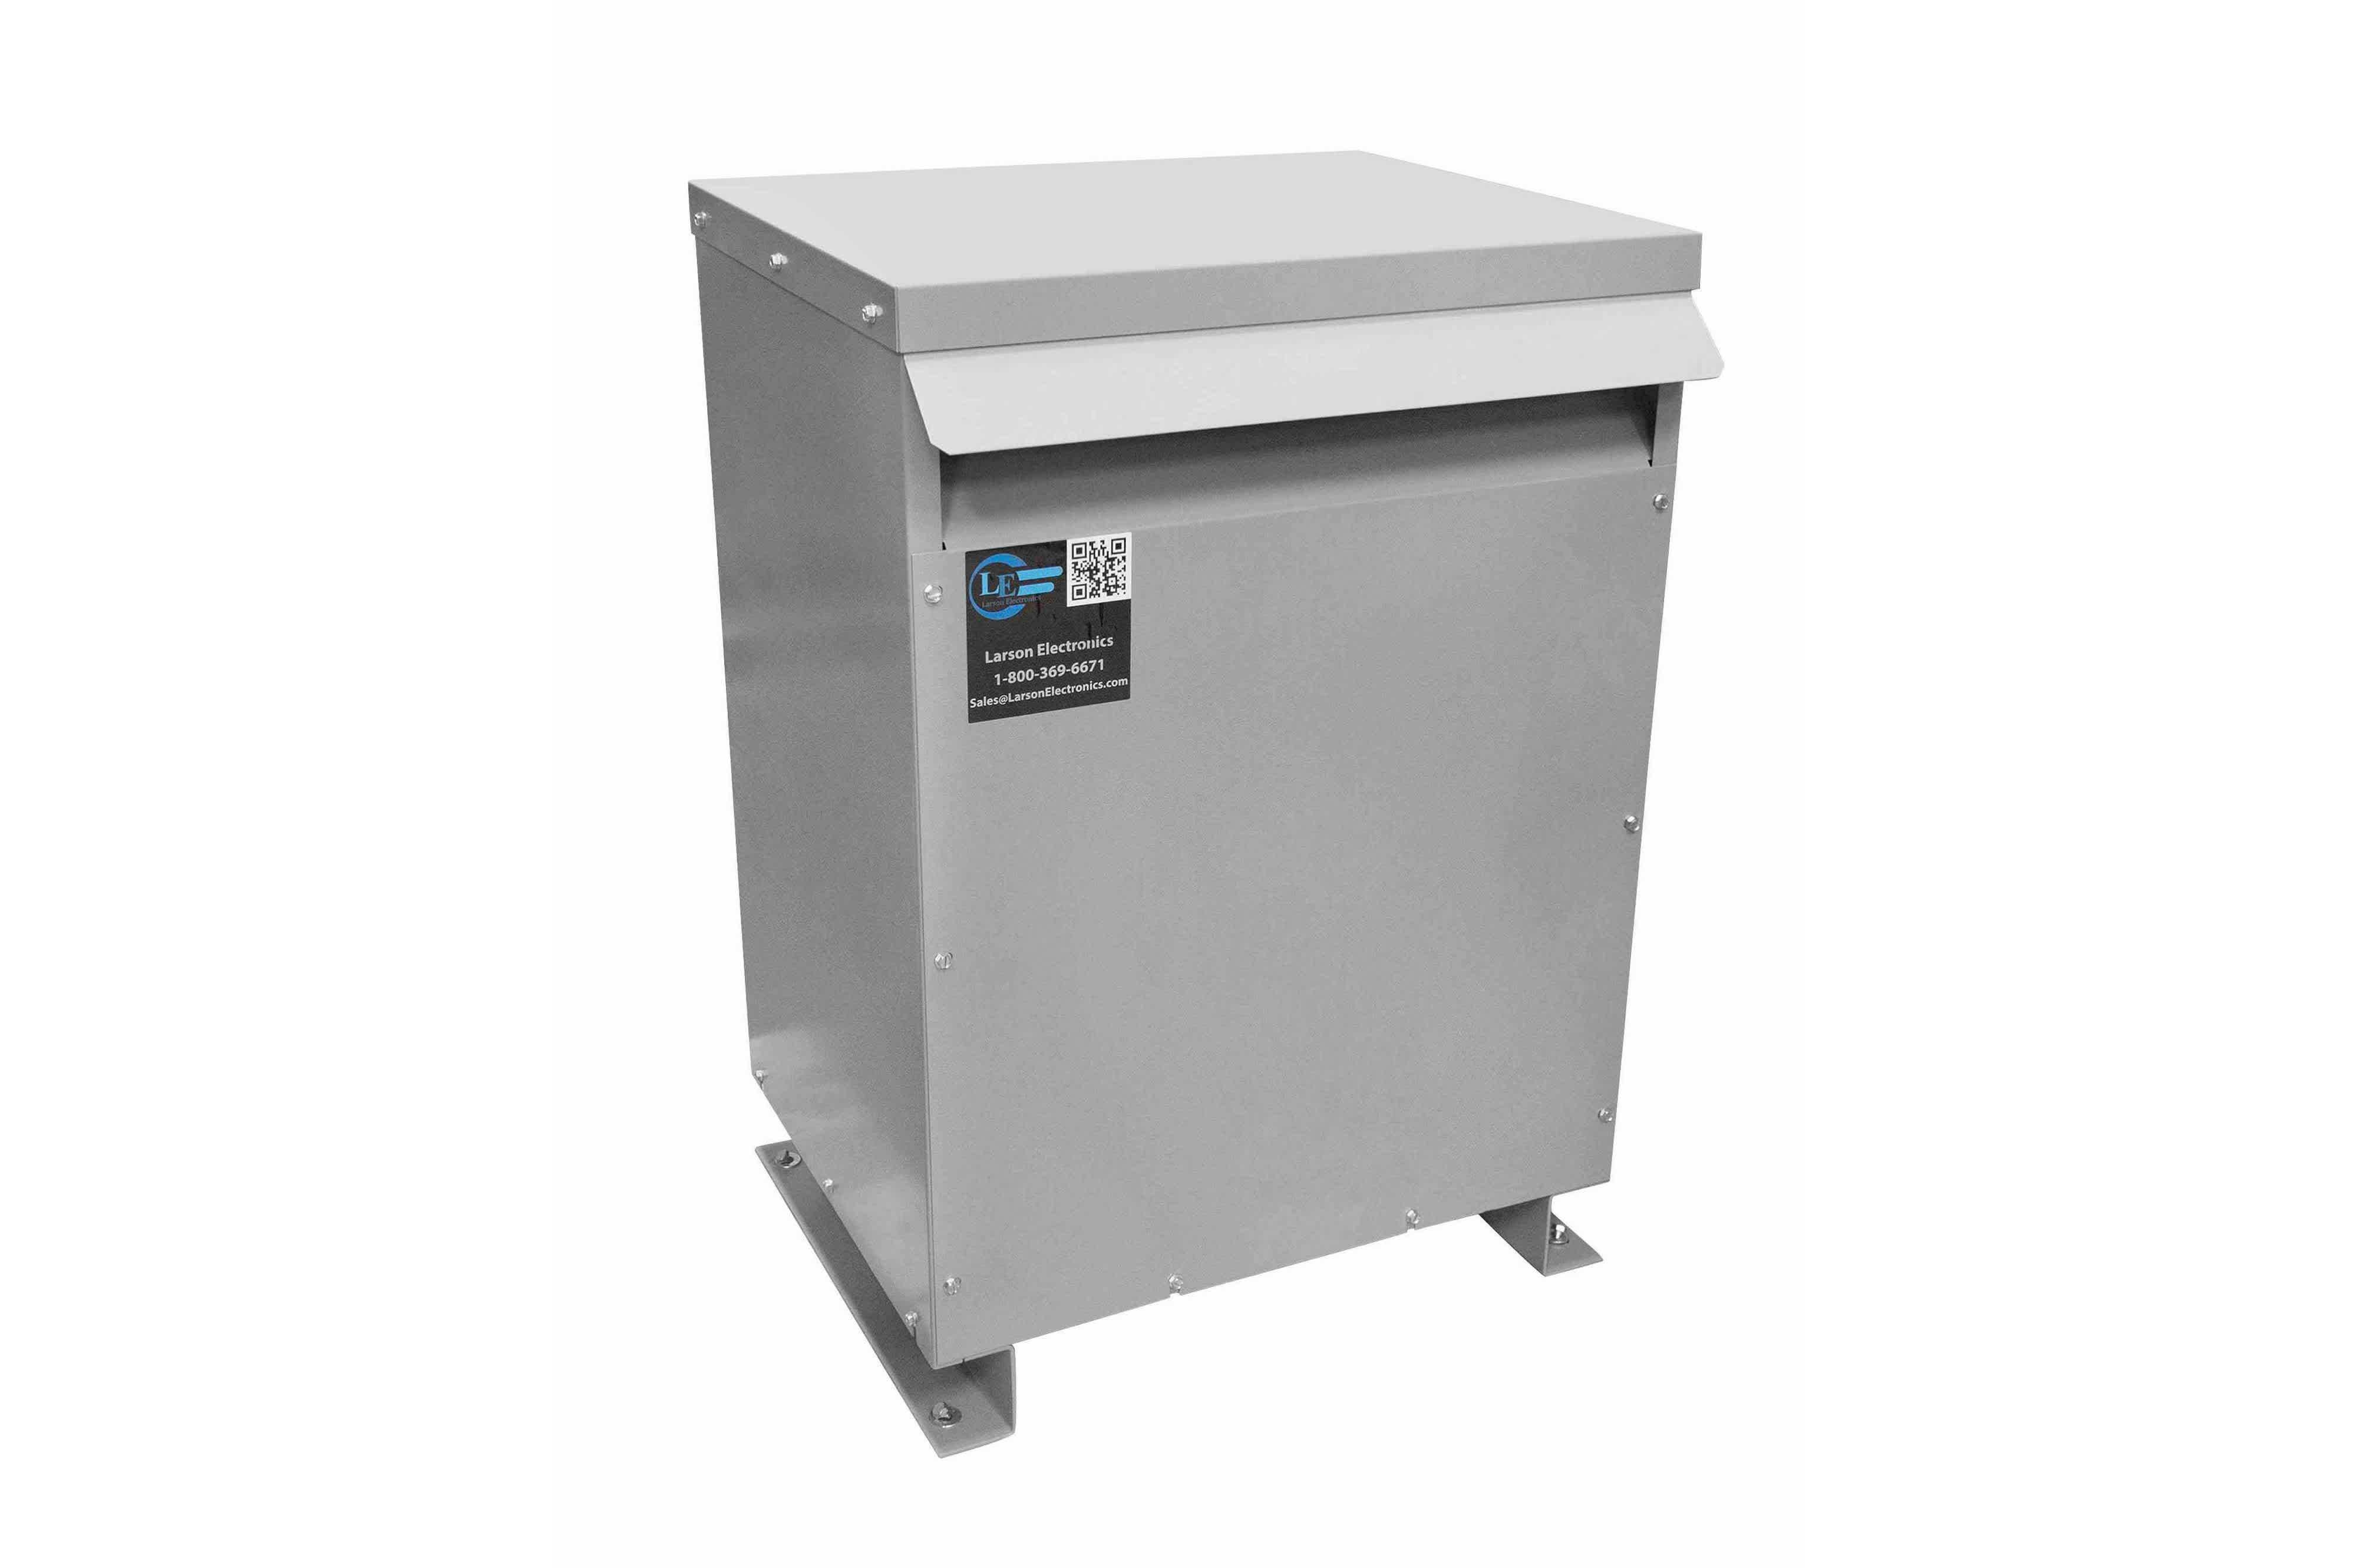 60 kVA 3PH DOE Transformer, 415V Delta Primary, 480Y/277 Wye-N Secondary, N3R, Ventilated, 60 Hz